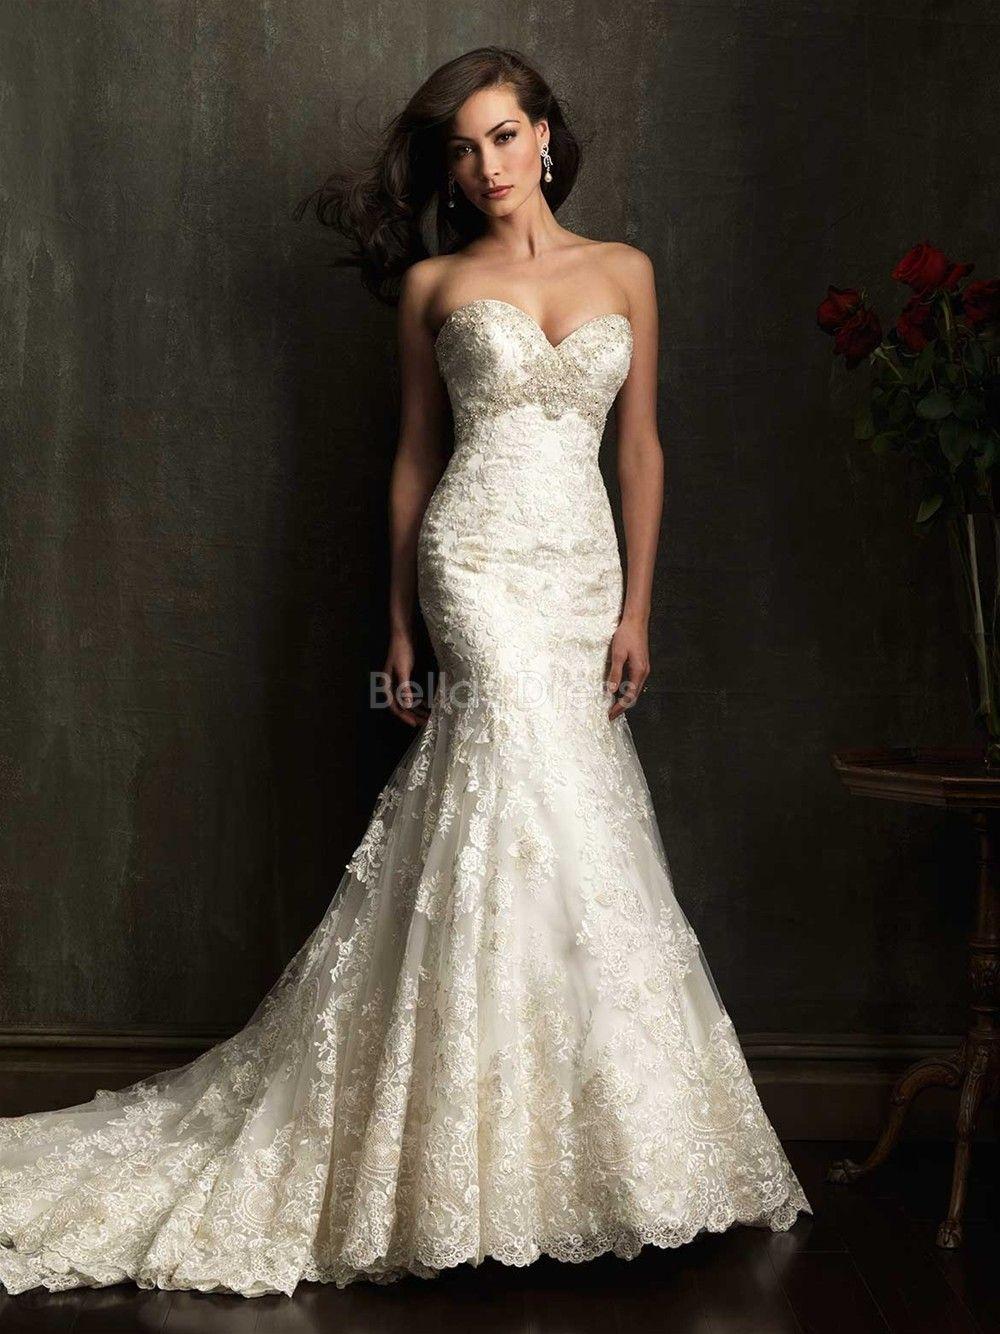 a80579fdb126 Elegant Mermaid Empire Waist Lace Sweetheart Floor Length Wedding Gowns